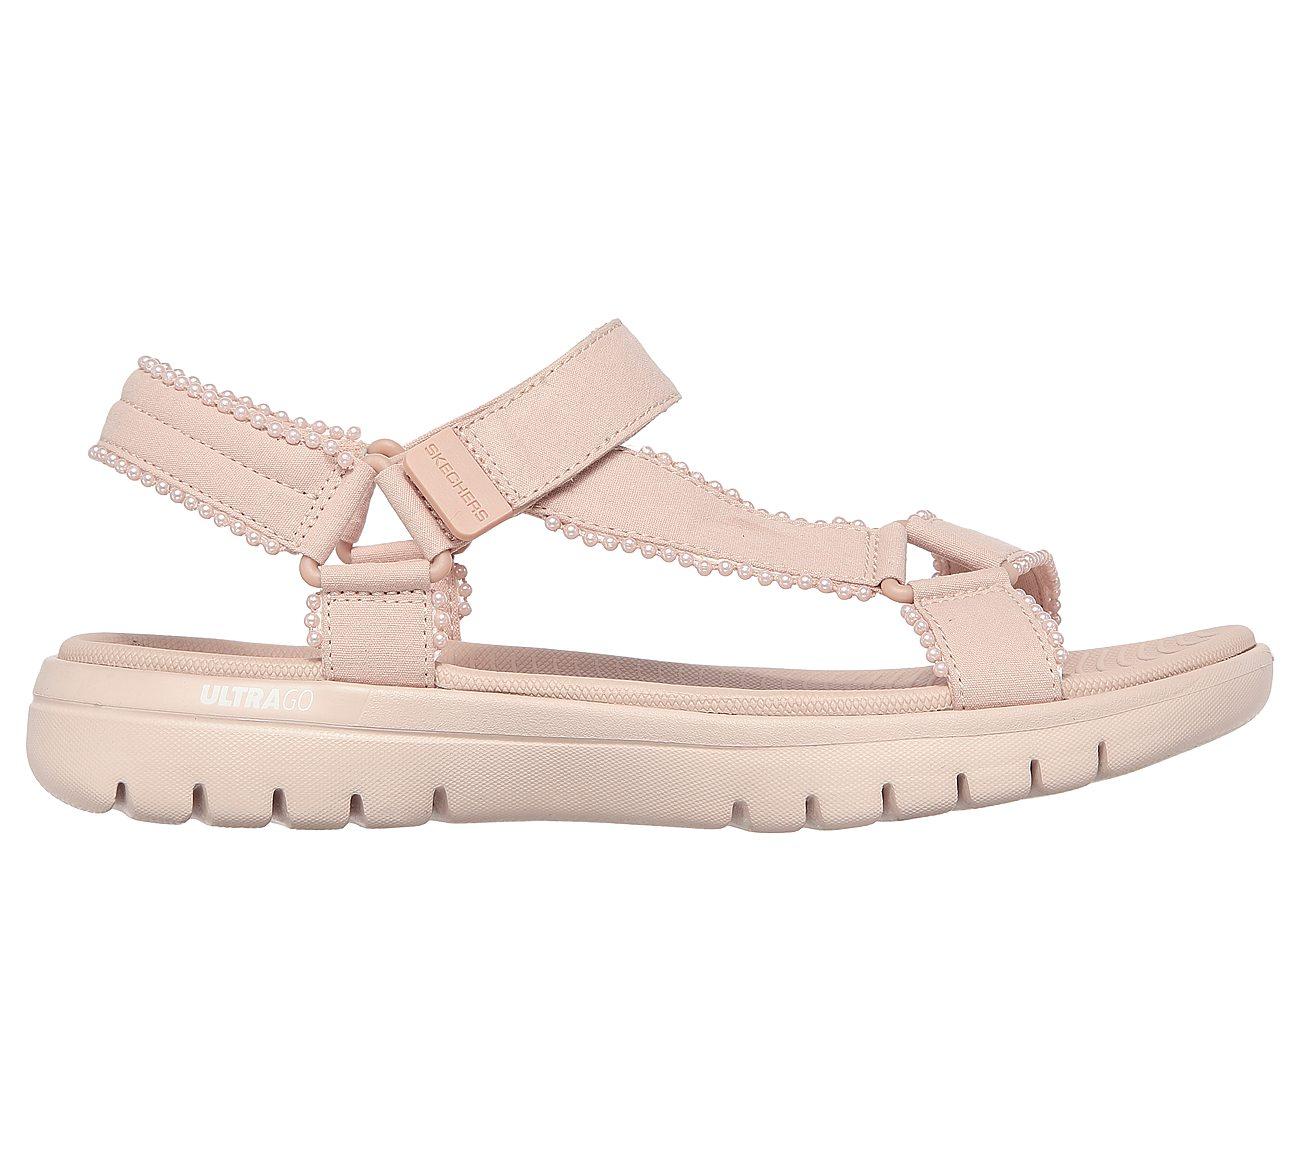 Buy Skechers Skechers On The Go Flex Classy Skechers Performance Shoes